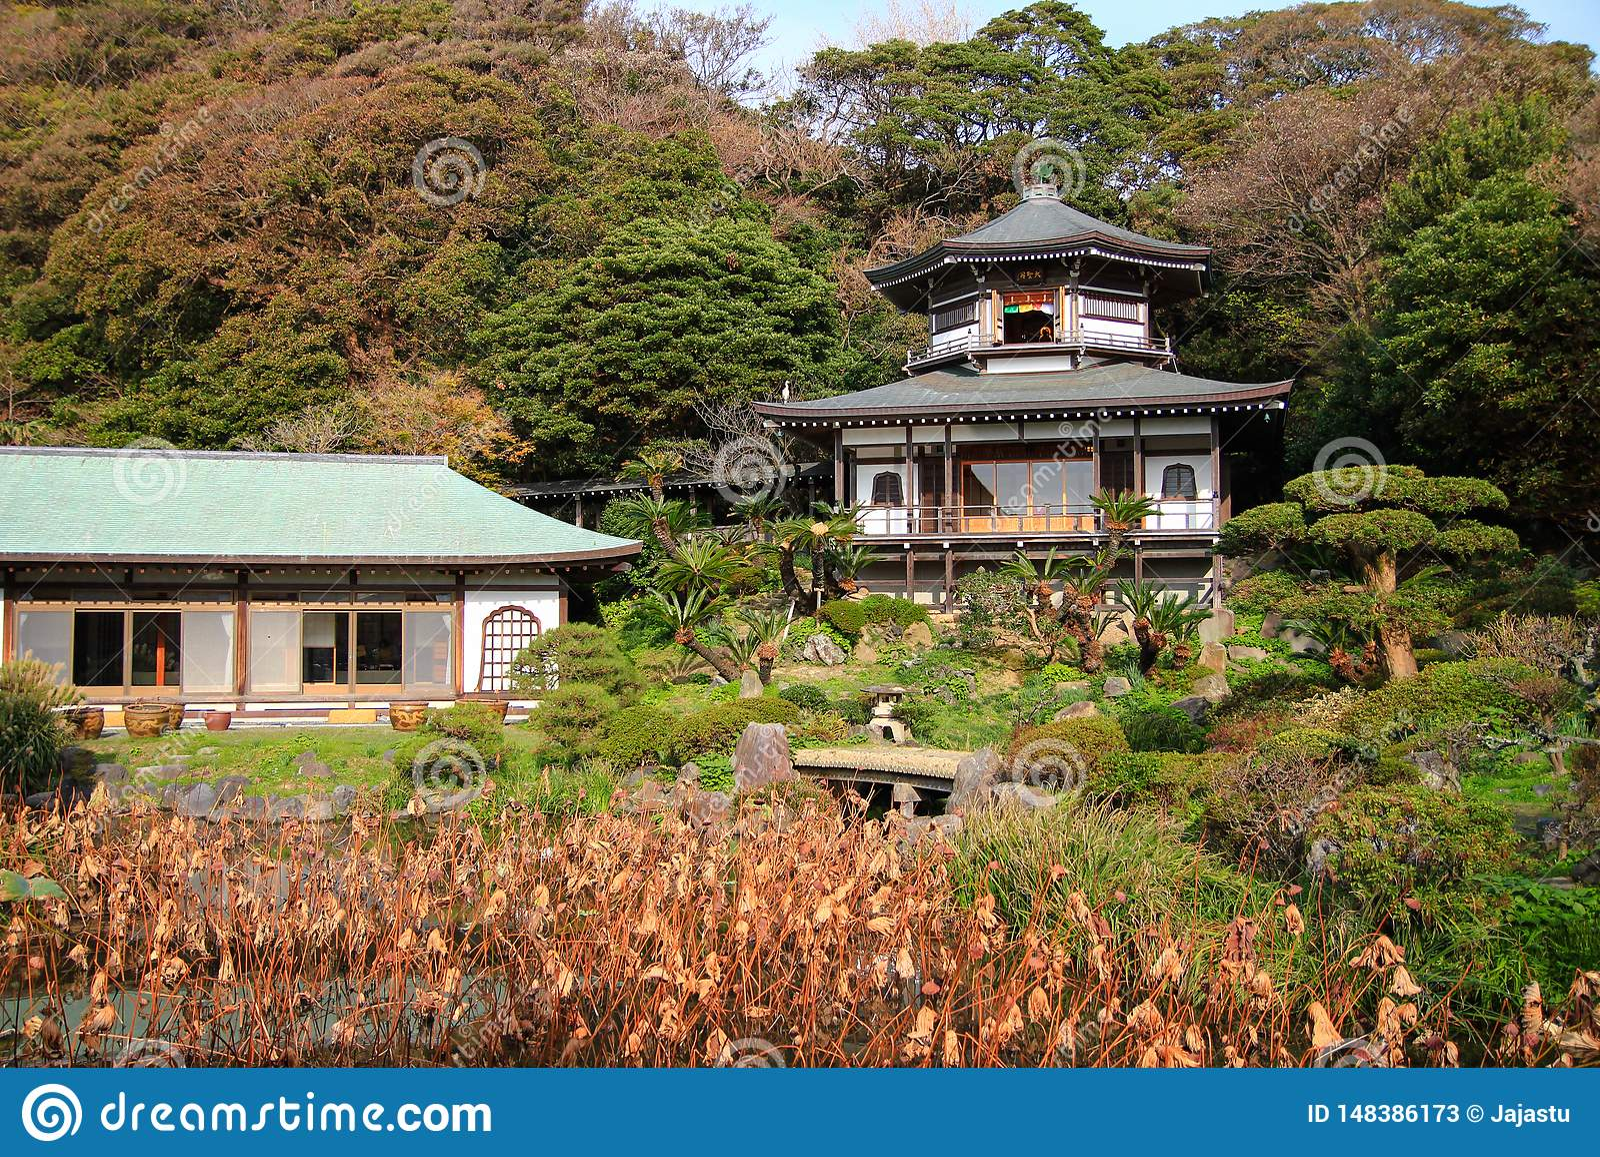 Sch?ner, bunter japanischer Garten, Kamakura